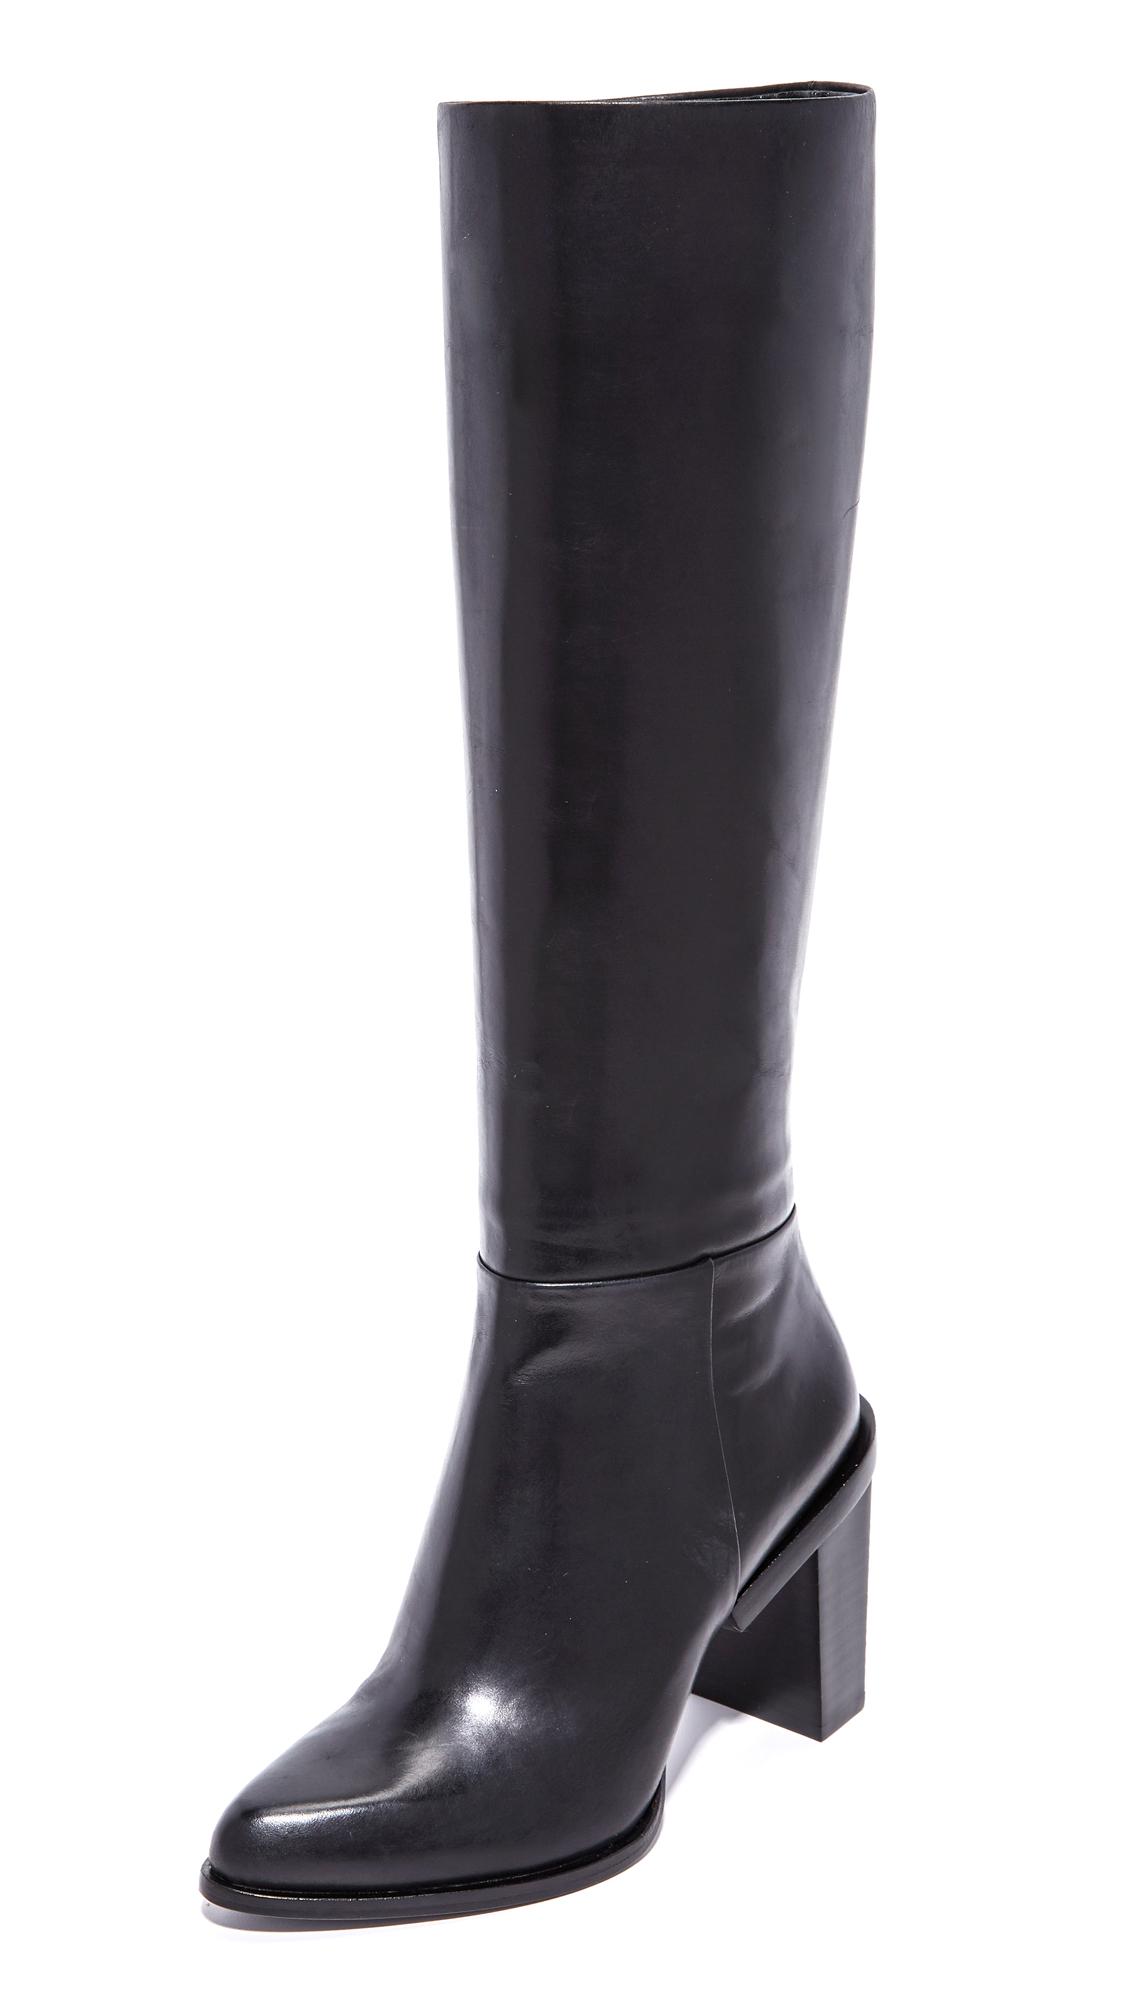 Dkny Pilar Knee High Pointy Boots - Black